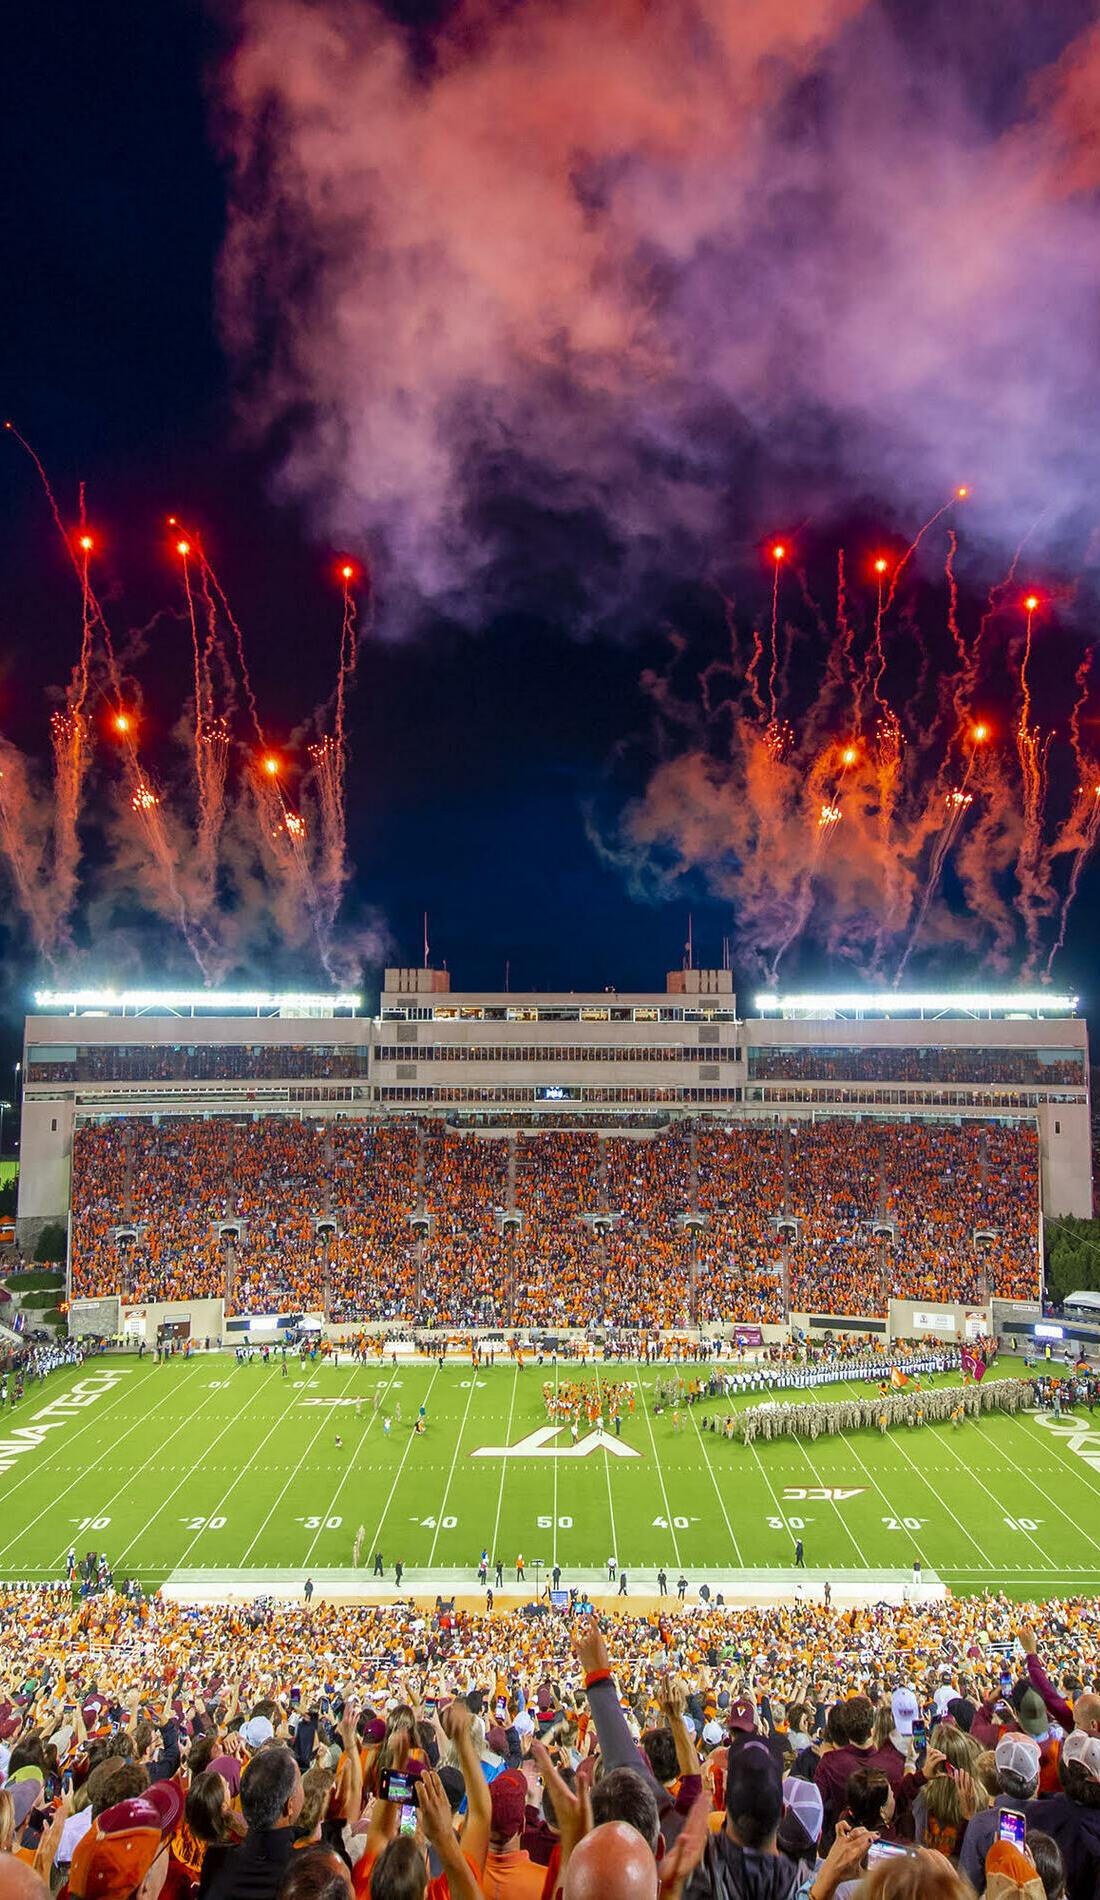 A Virginia Tech Hokies Football live event